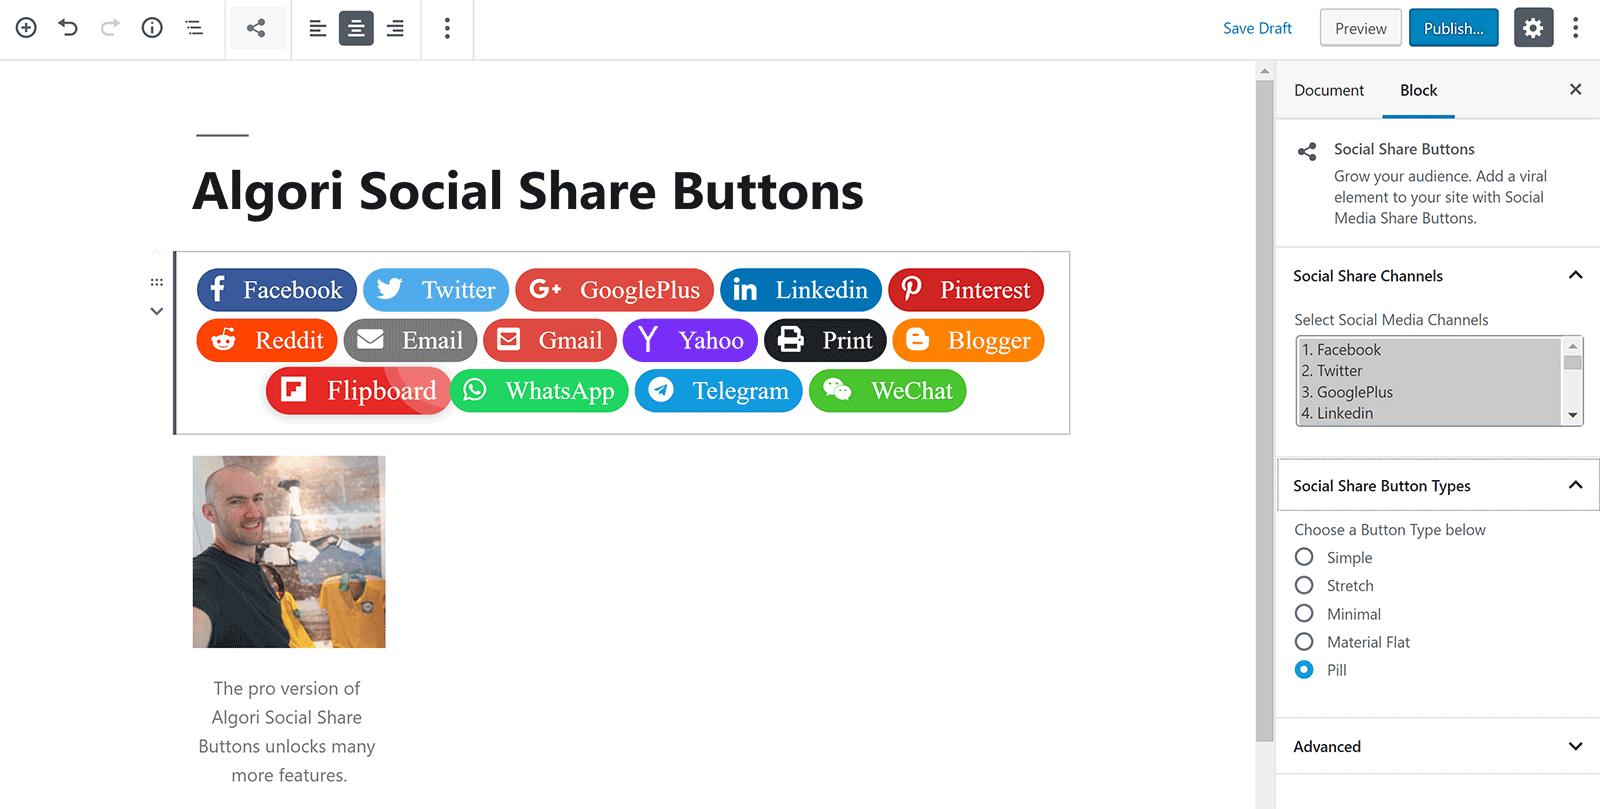 Algori Social Share Buttons